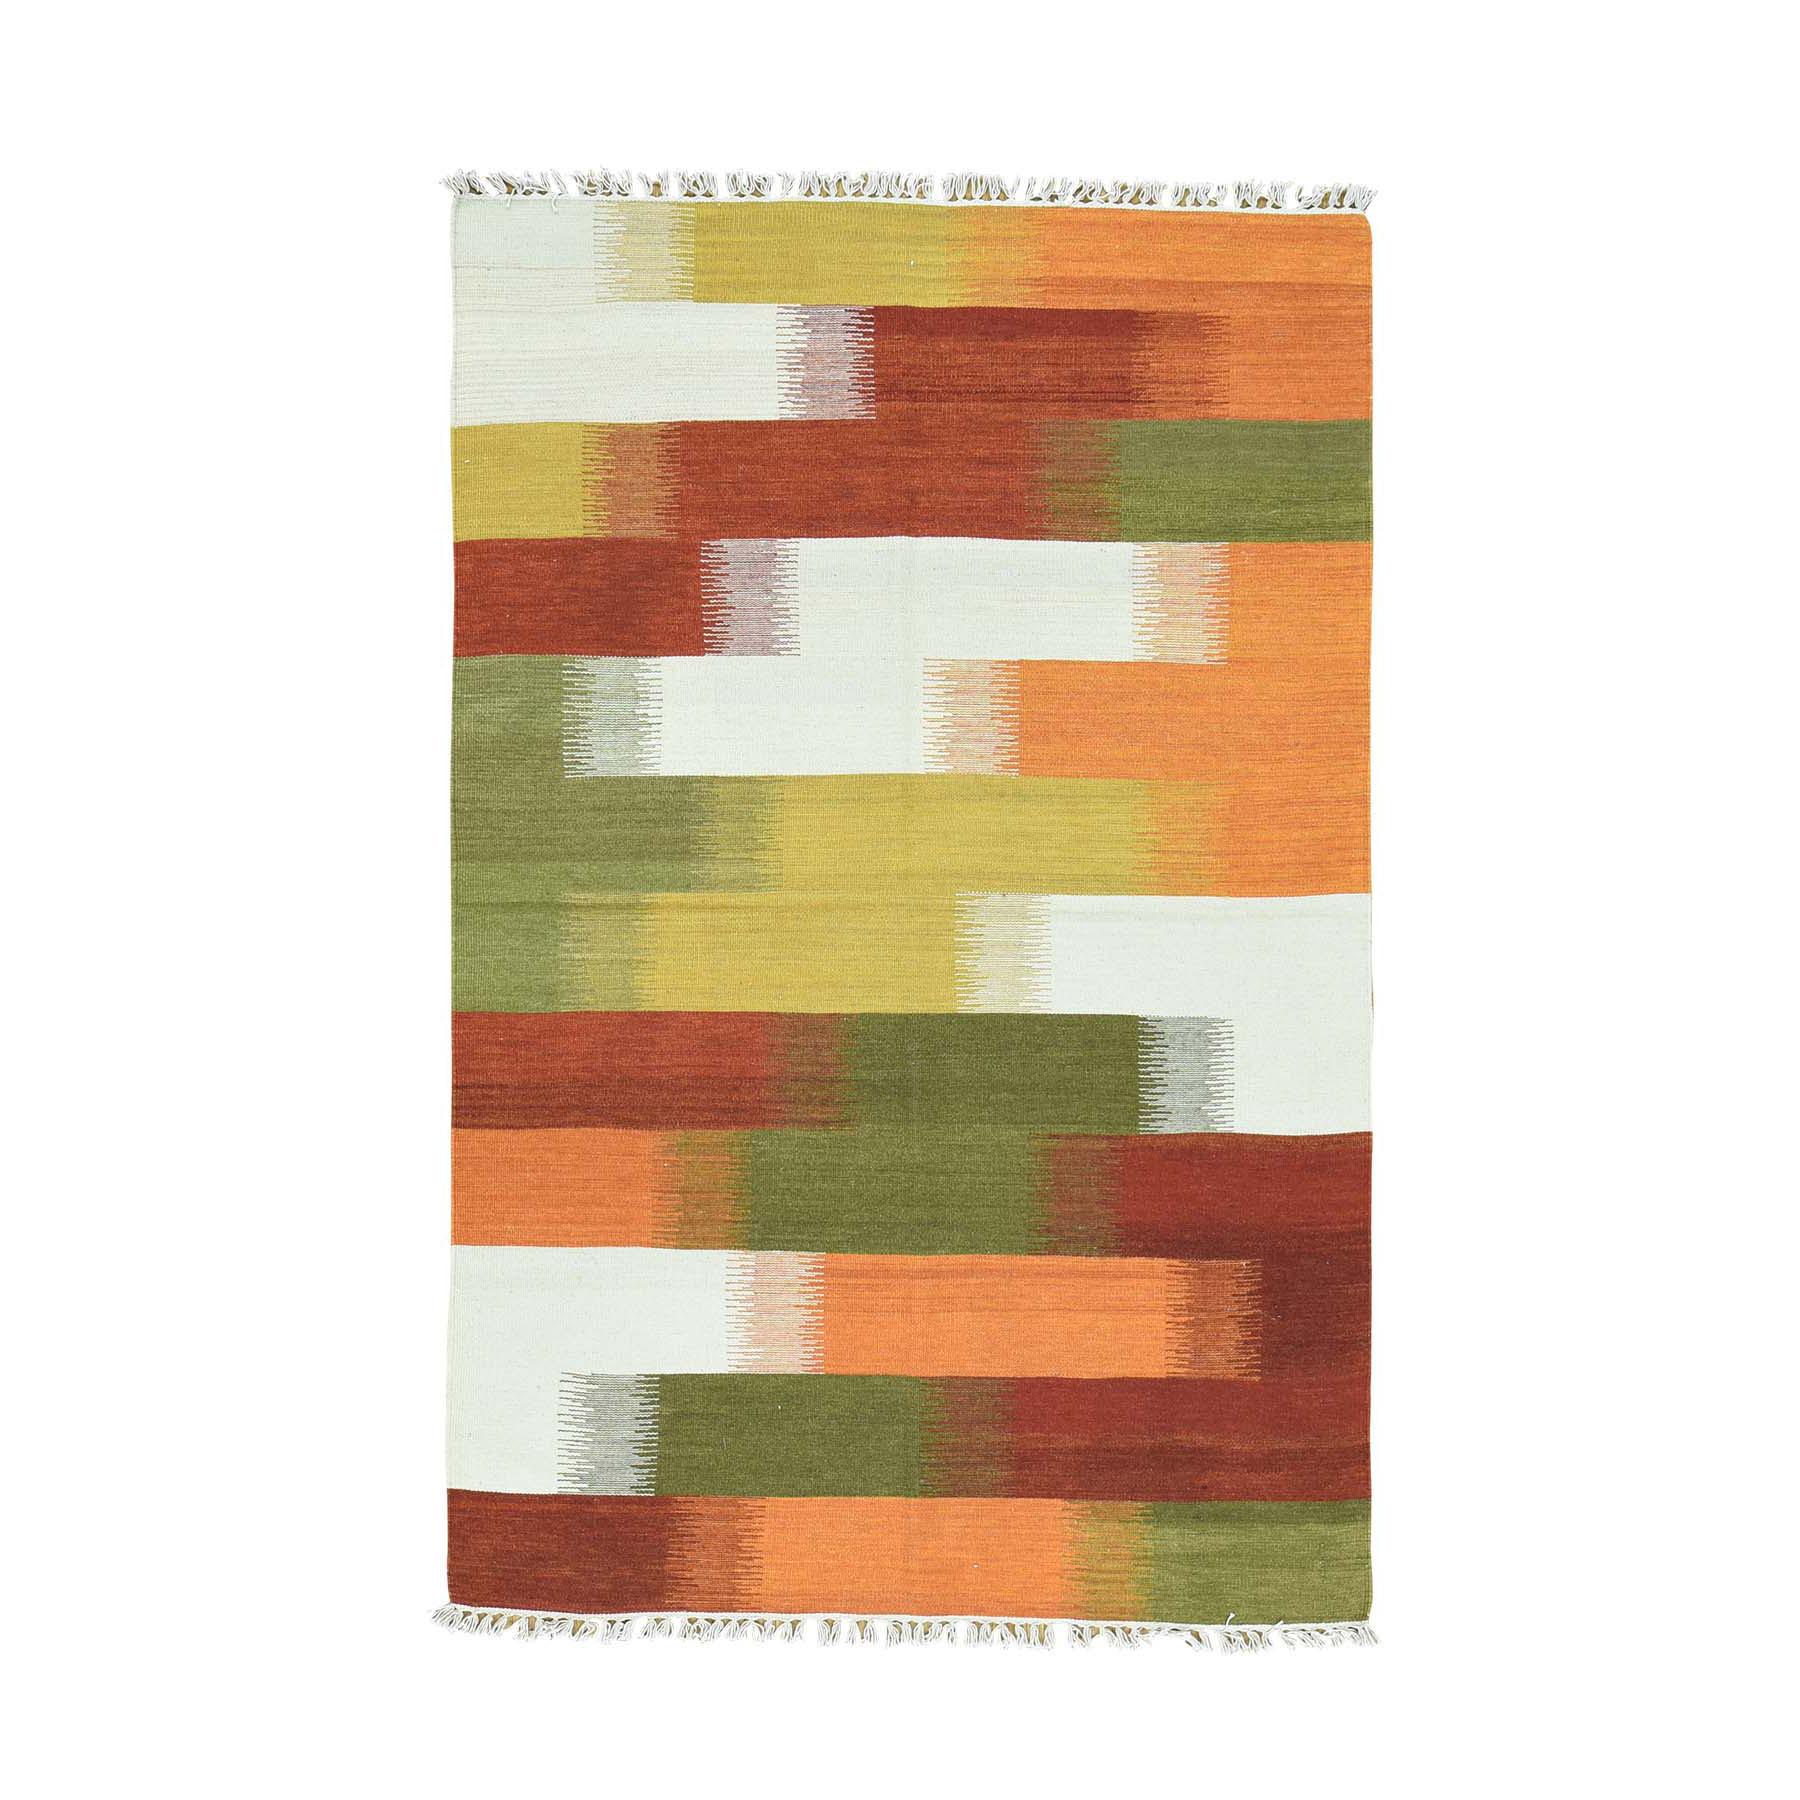 "4'X6'2"" Hand-Woven Durie Kilim 100 Percent Wool Flat Weave Colorful Rug moaca8b6"